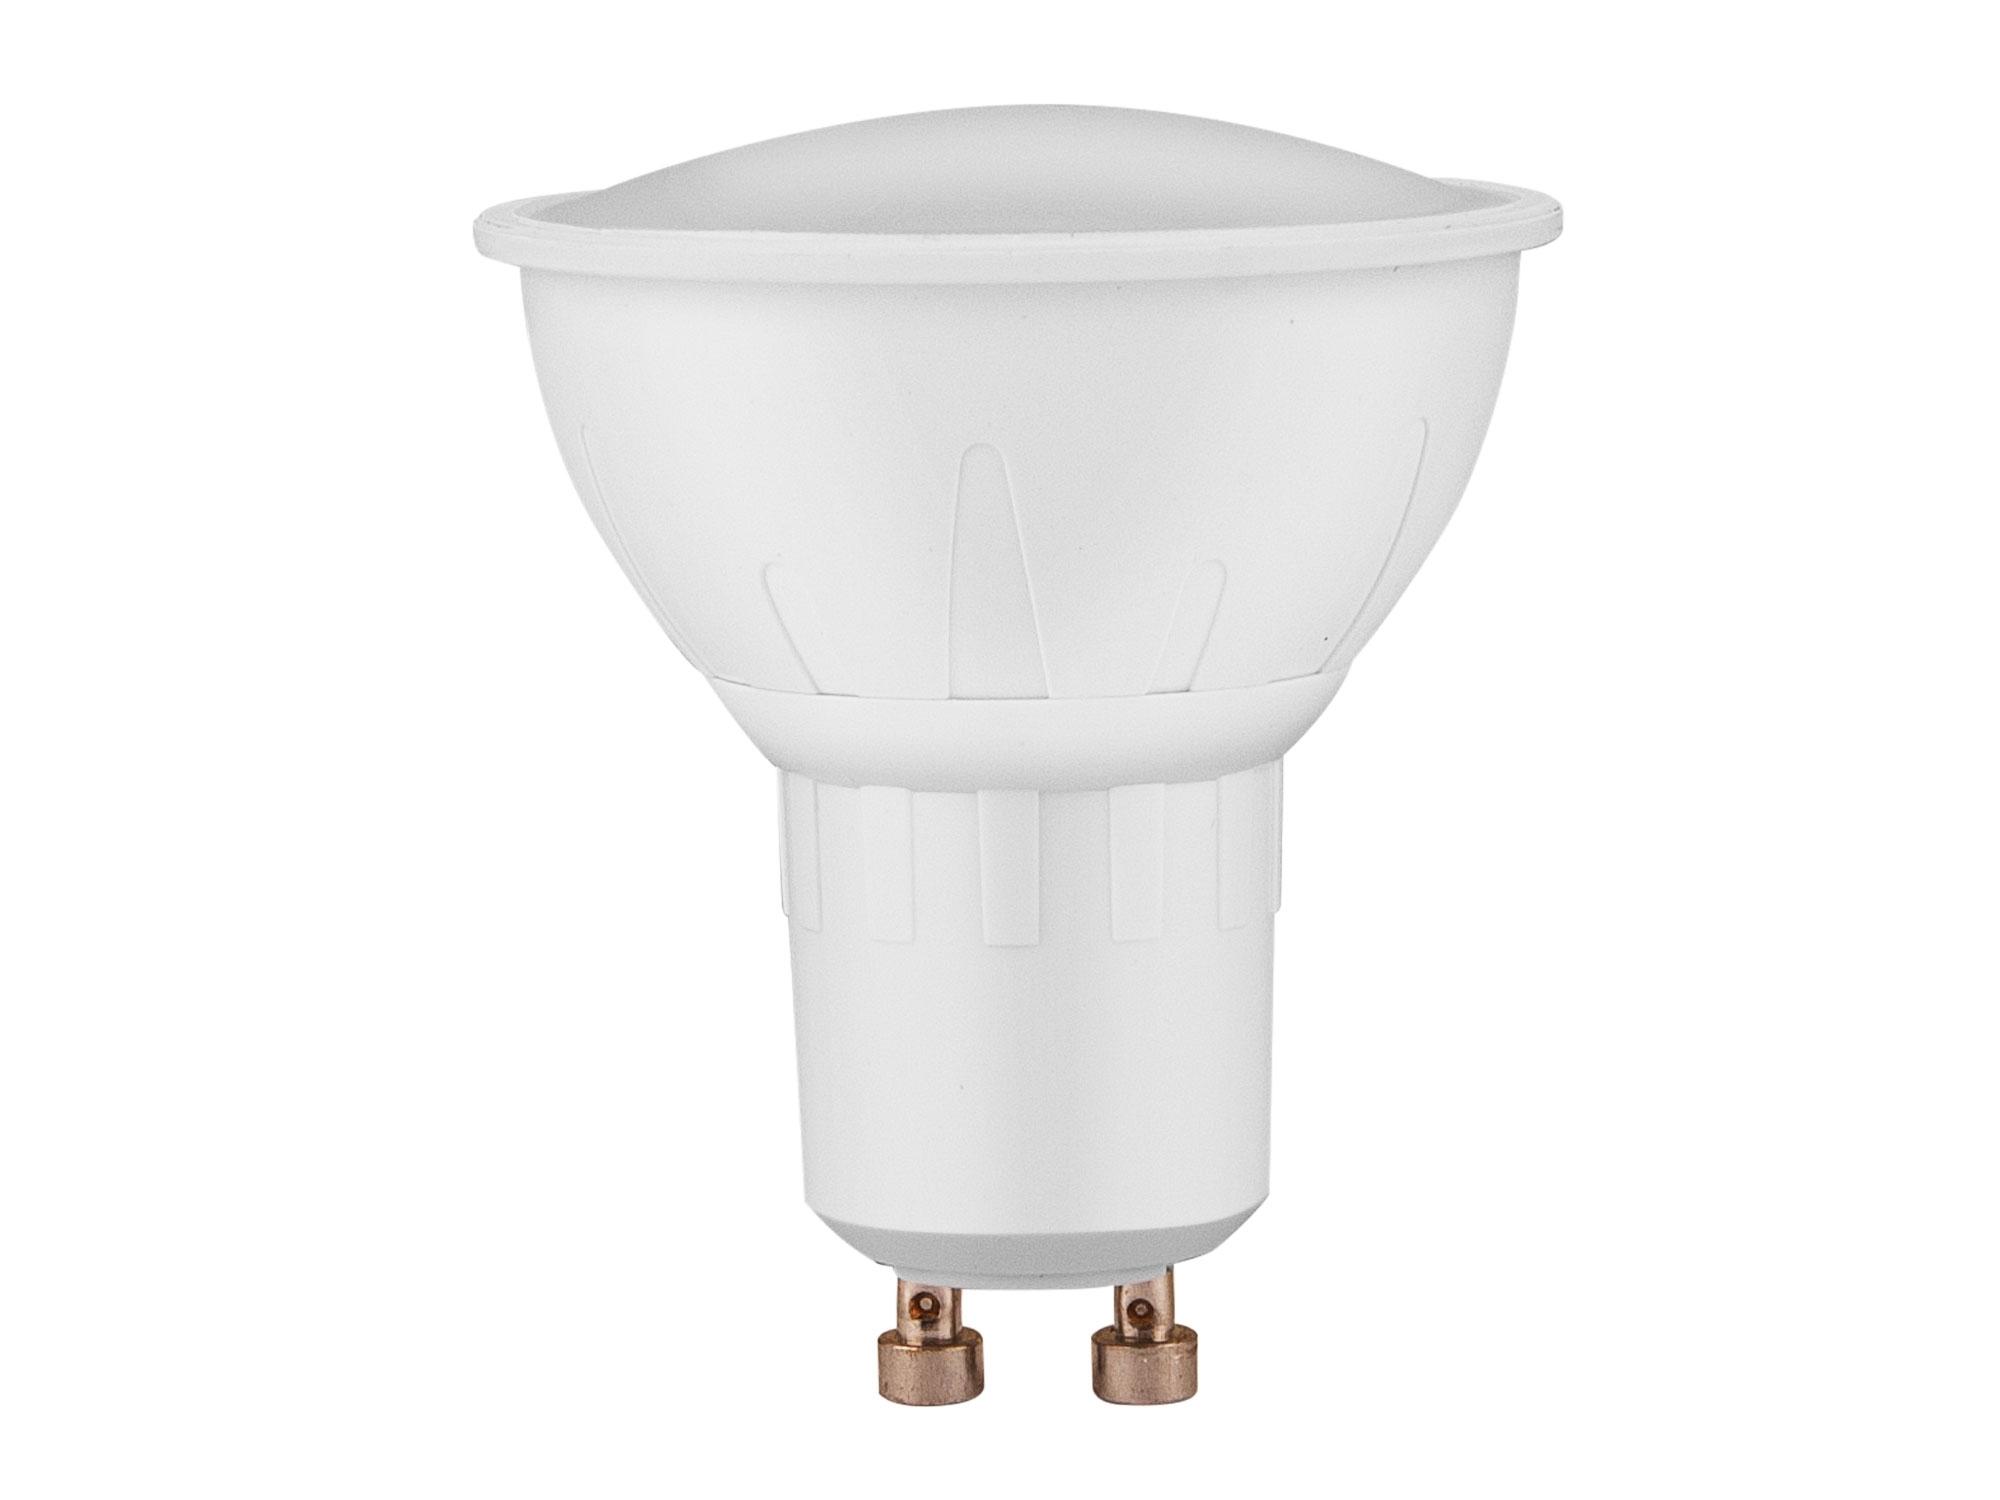 žárovka LED reflektorová, 4W, 320lm, GU10, teplá bílá, EXTOL LIGHT 43032